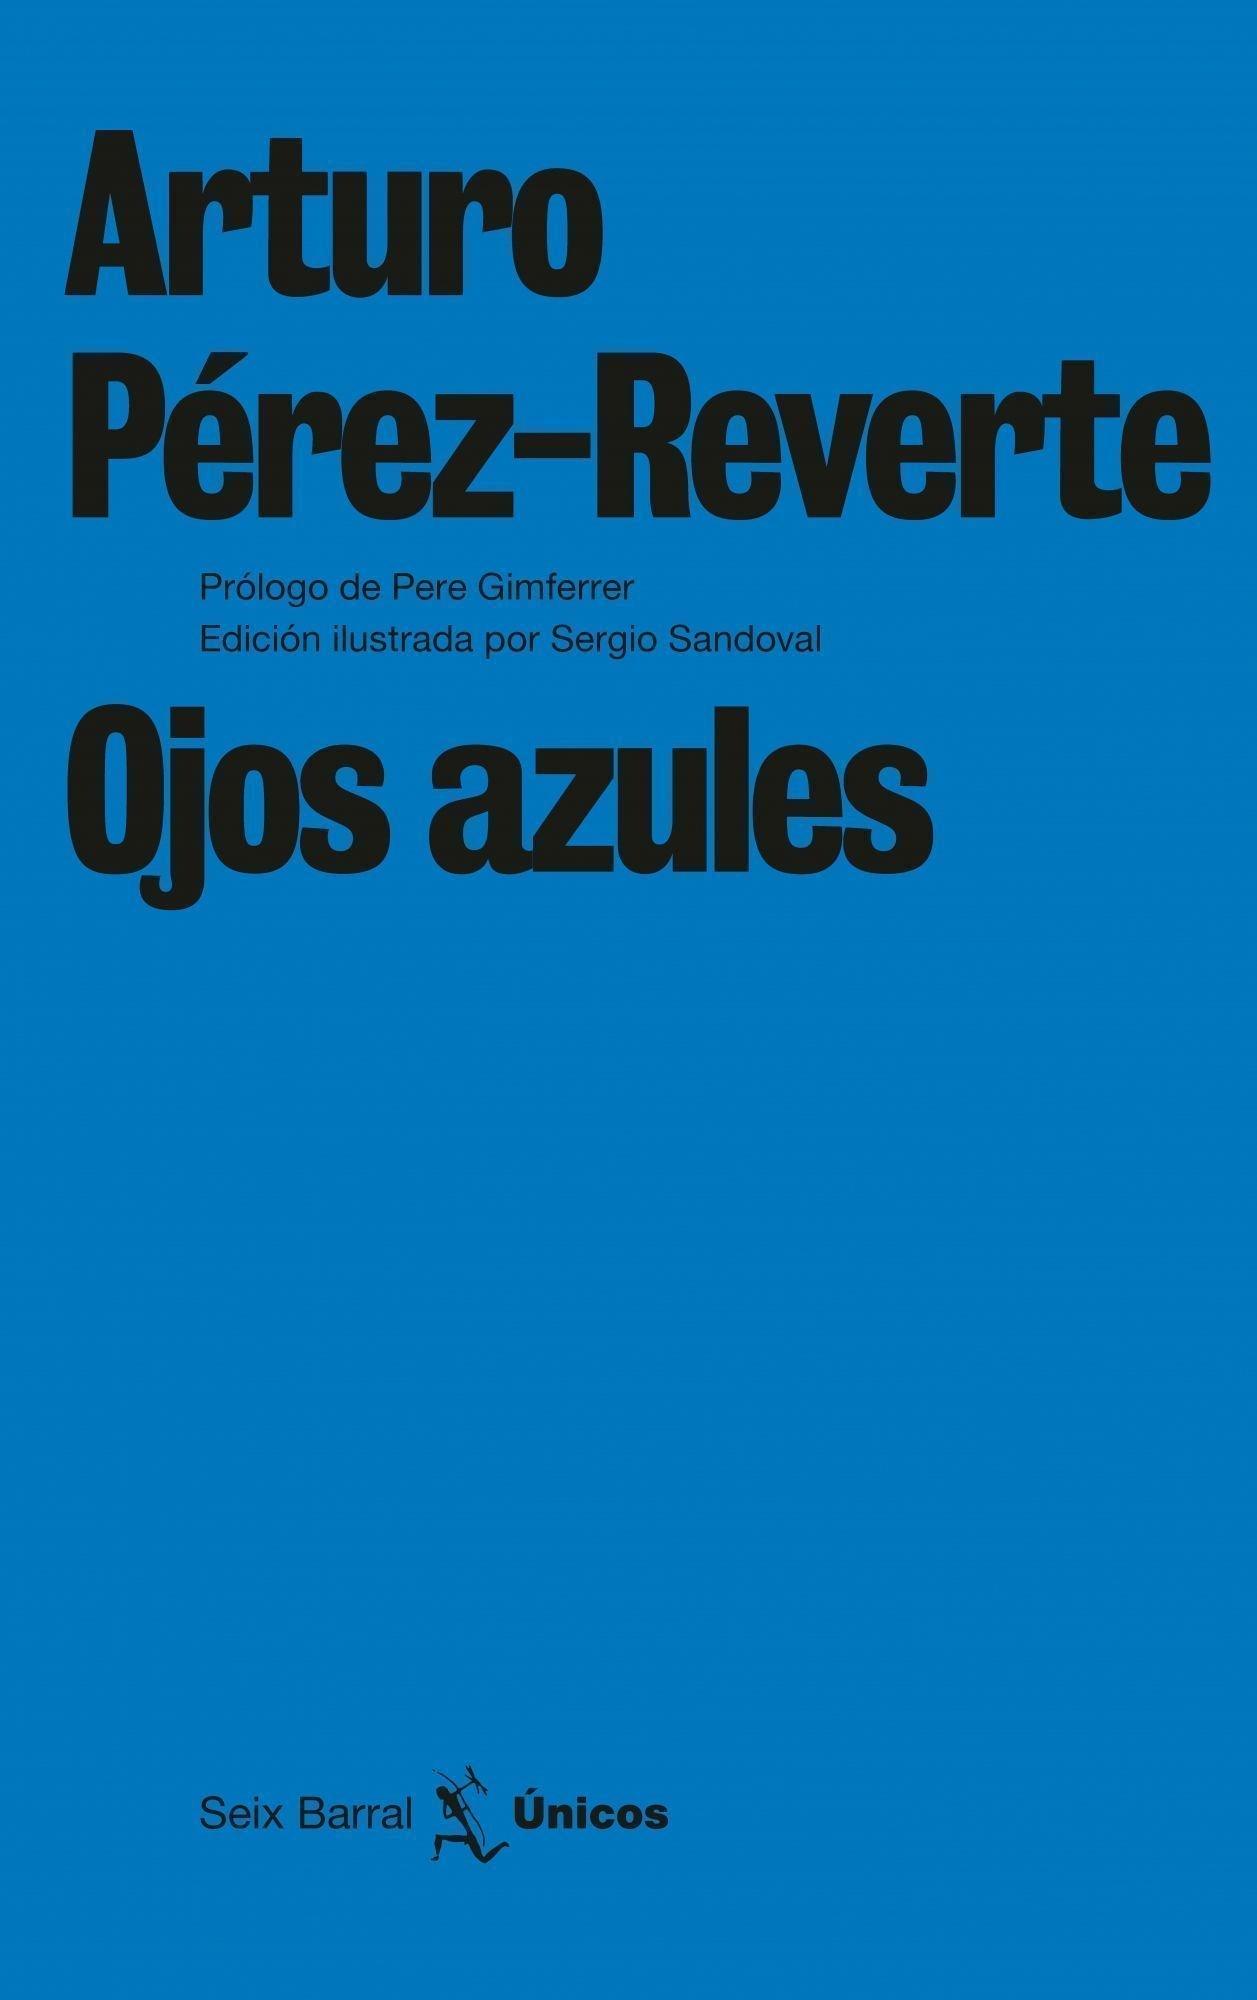 Ojos azules (Únicos): Amazon.es: Pérez-Reverte, Arturo: Libros